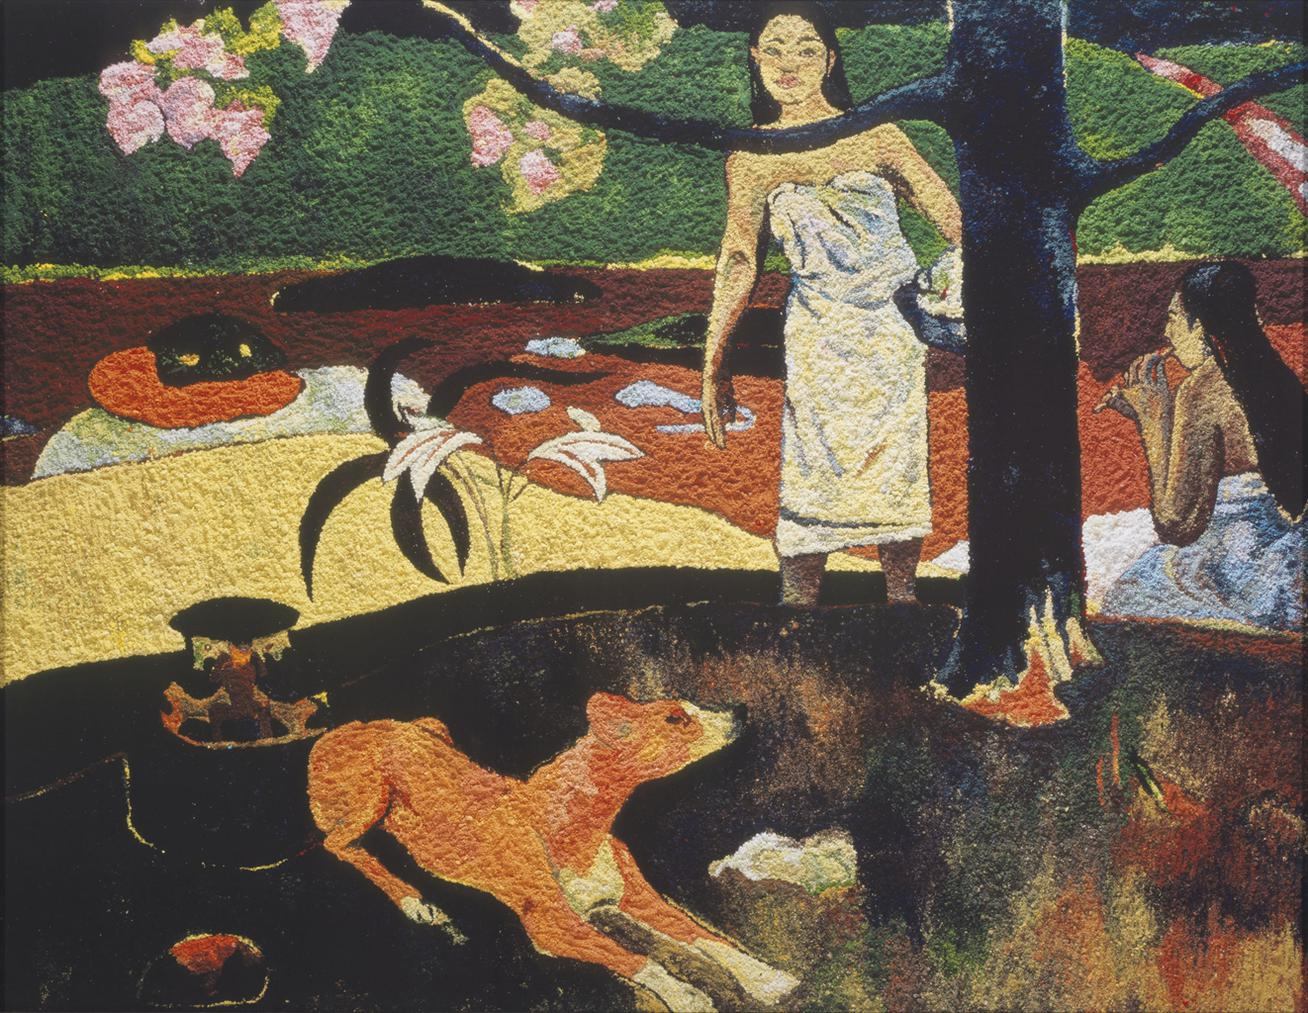 Vik Muniz-Pastorales Tahitiennes, After Paul Gauguin, From Pictures Of Pigment-2005